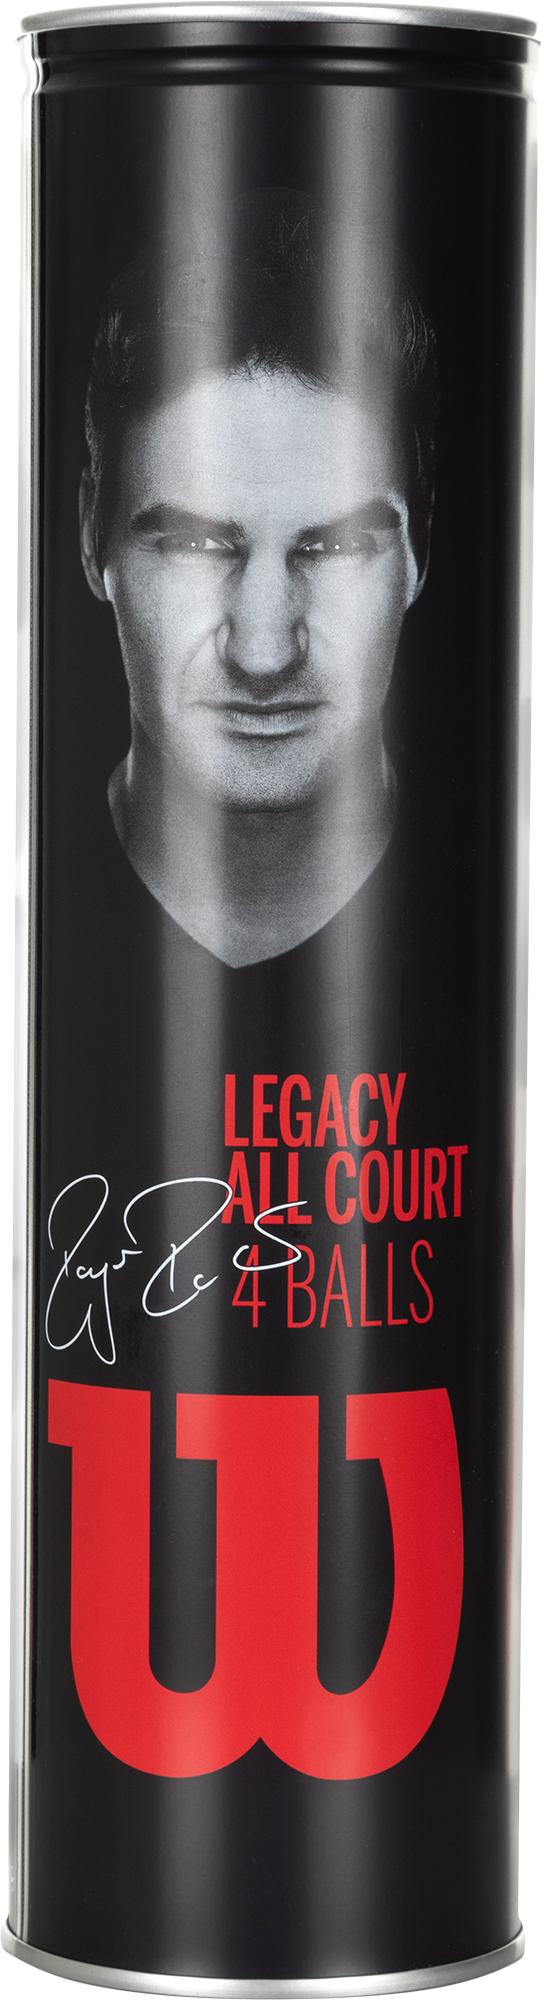 Wilson Набор мячей для большого тенниса Roger Federer Legacy